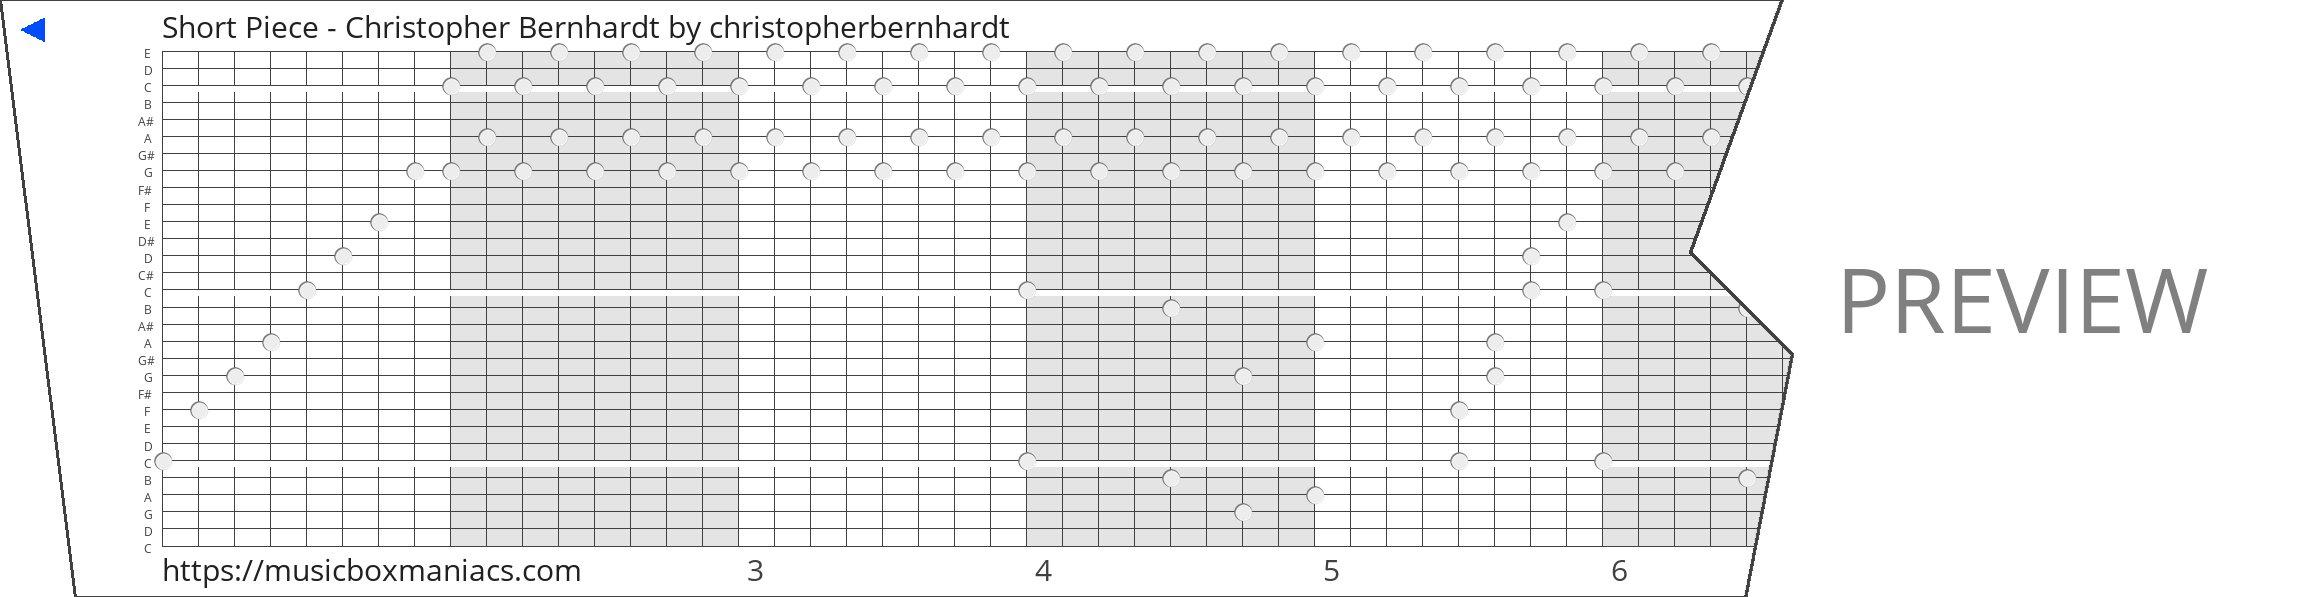 Short Piece - Christopher Bernhardt 30 note music box paper strip